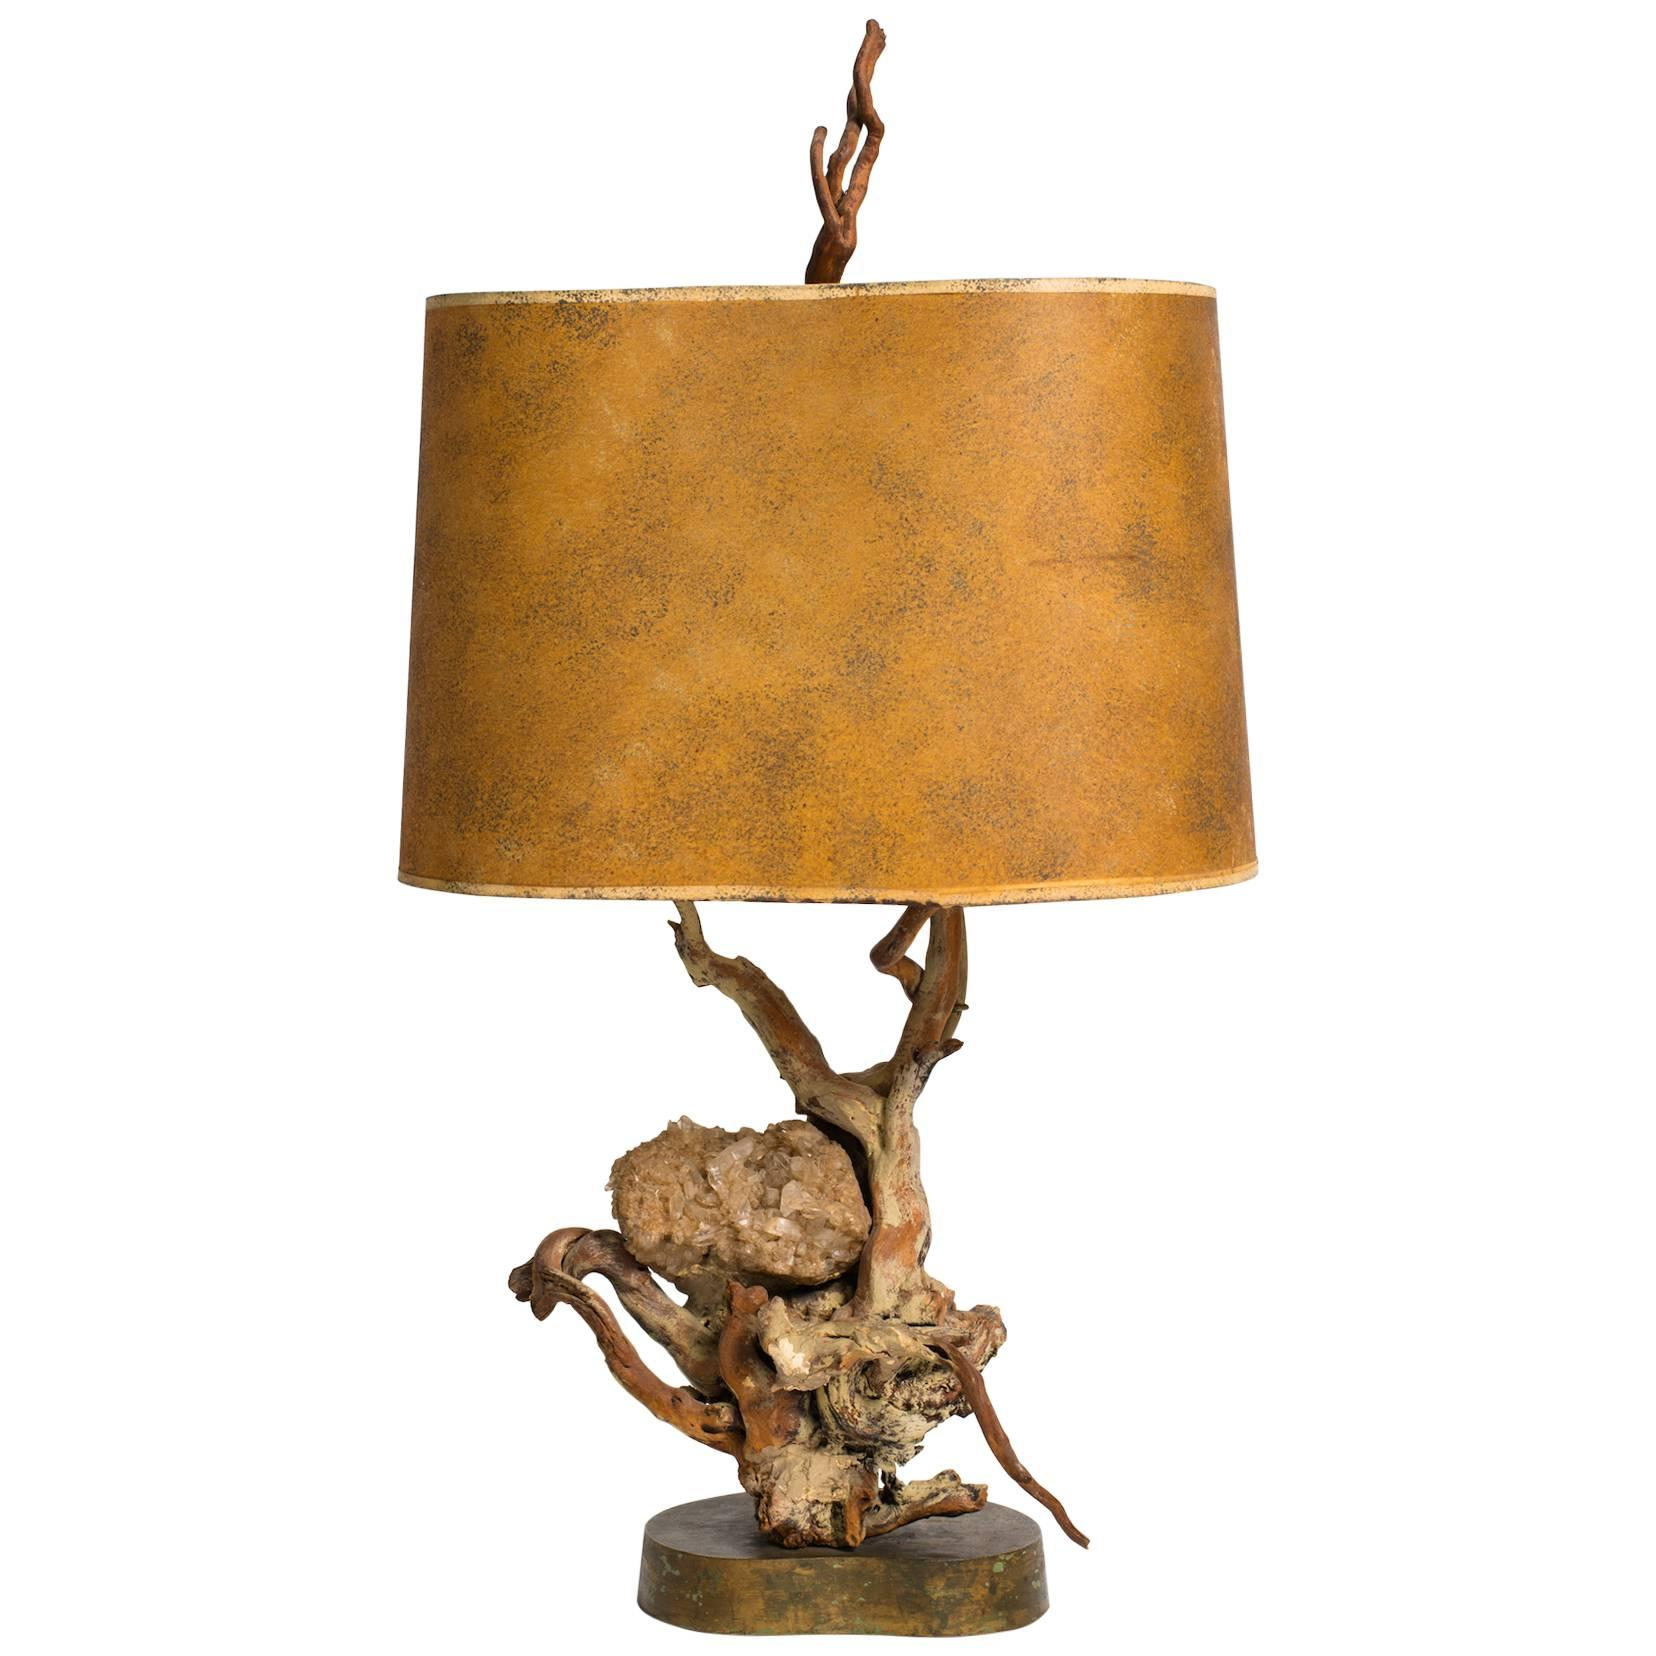 Driftwood and Quartz Table Lamp